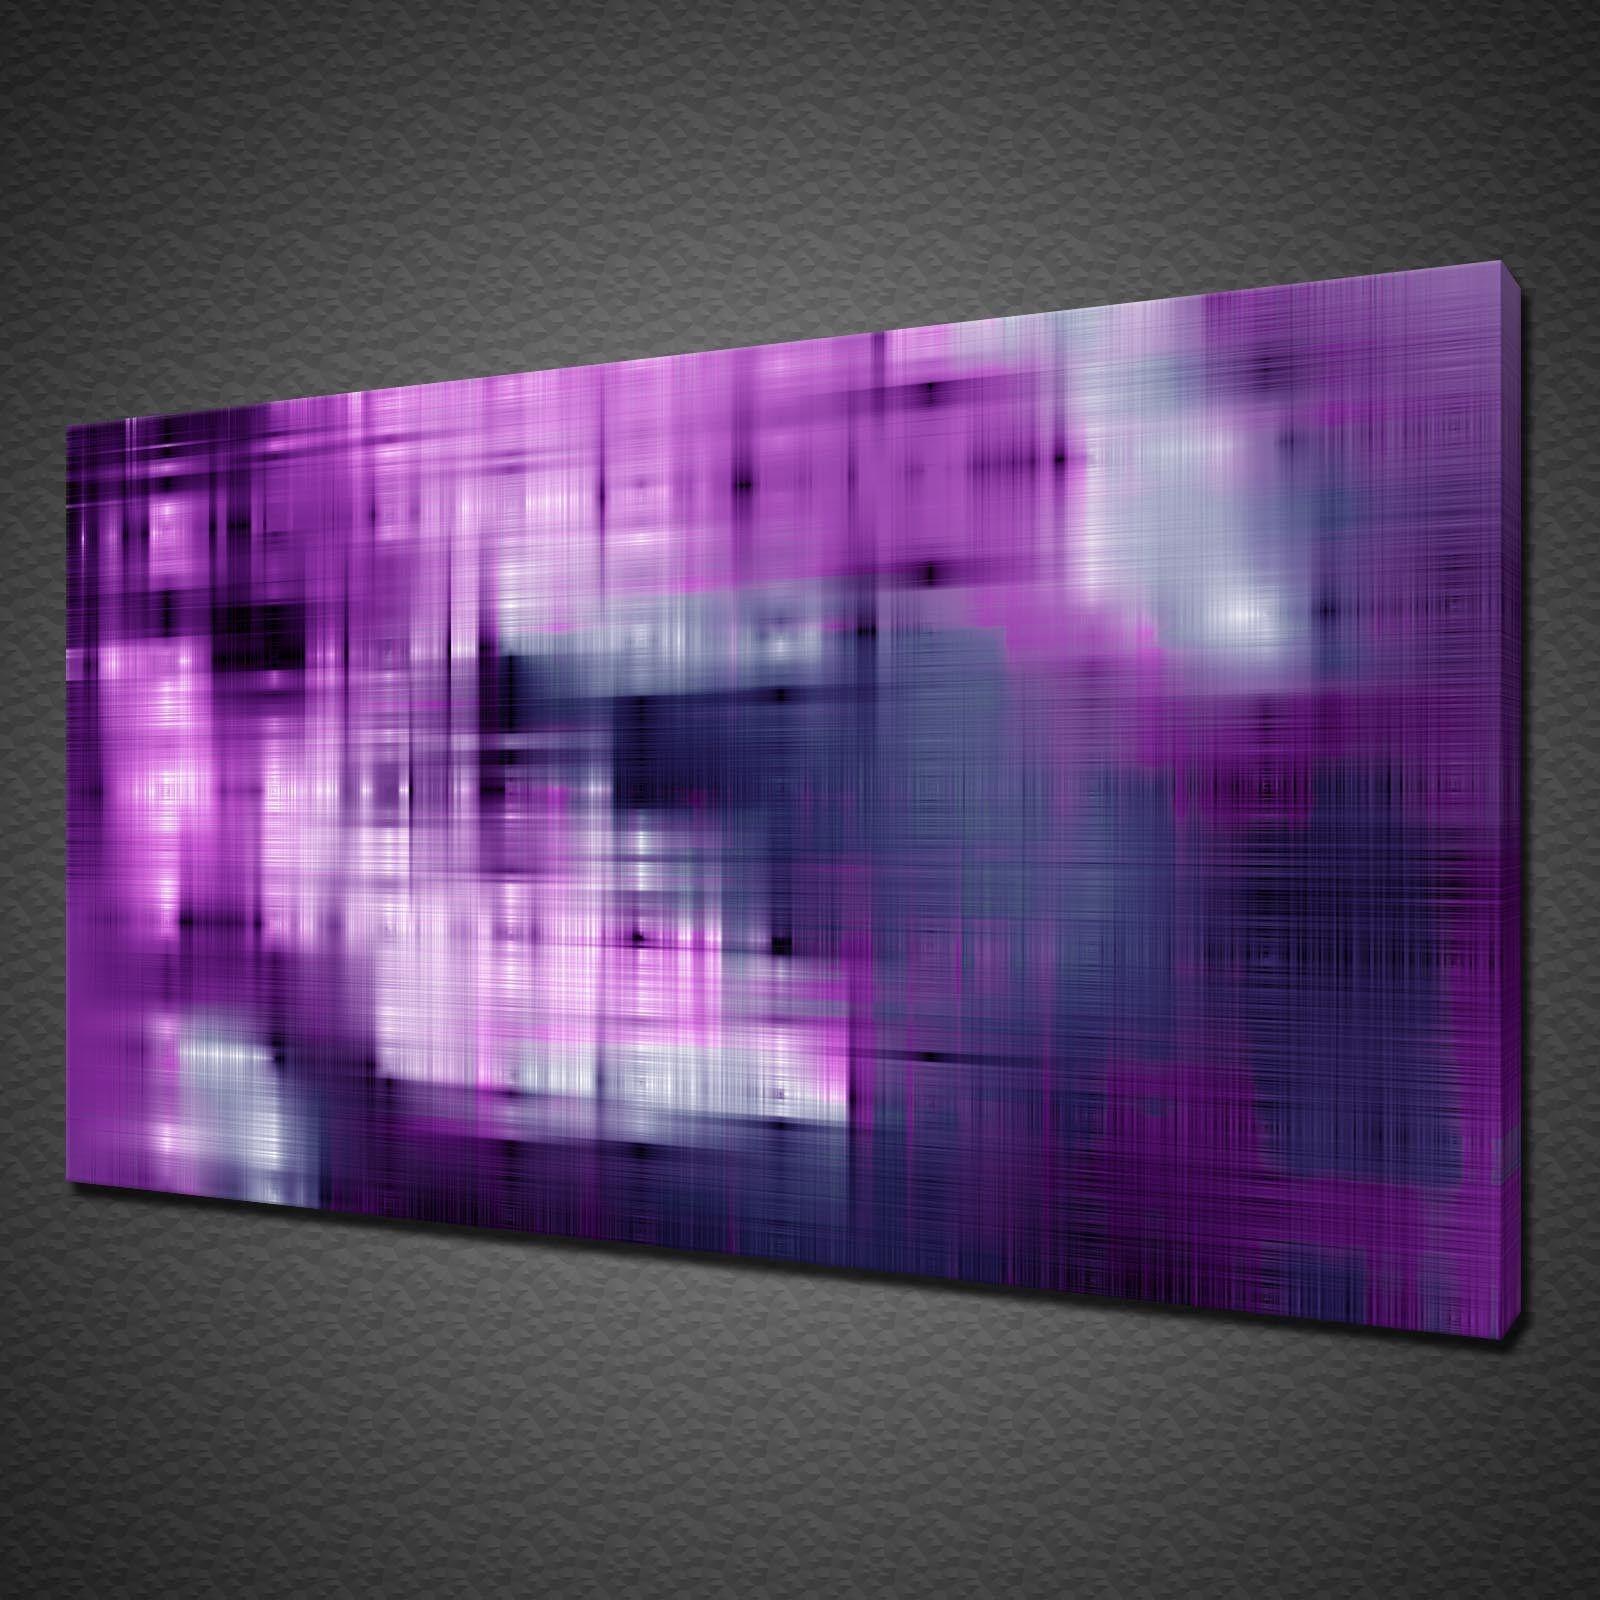 Design Astratto Viola Bianco Blu Tela Stampa Wall Art Picture Foto